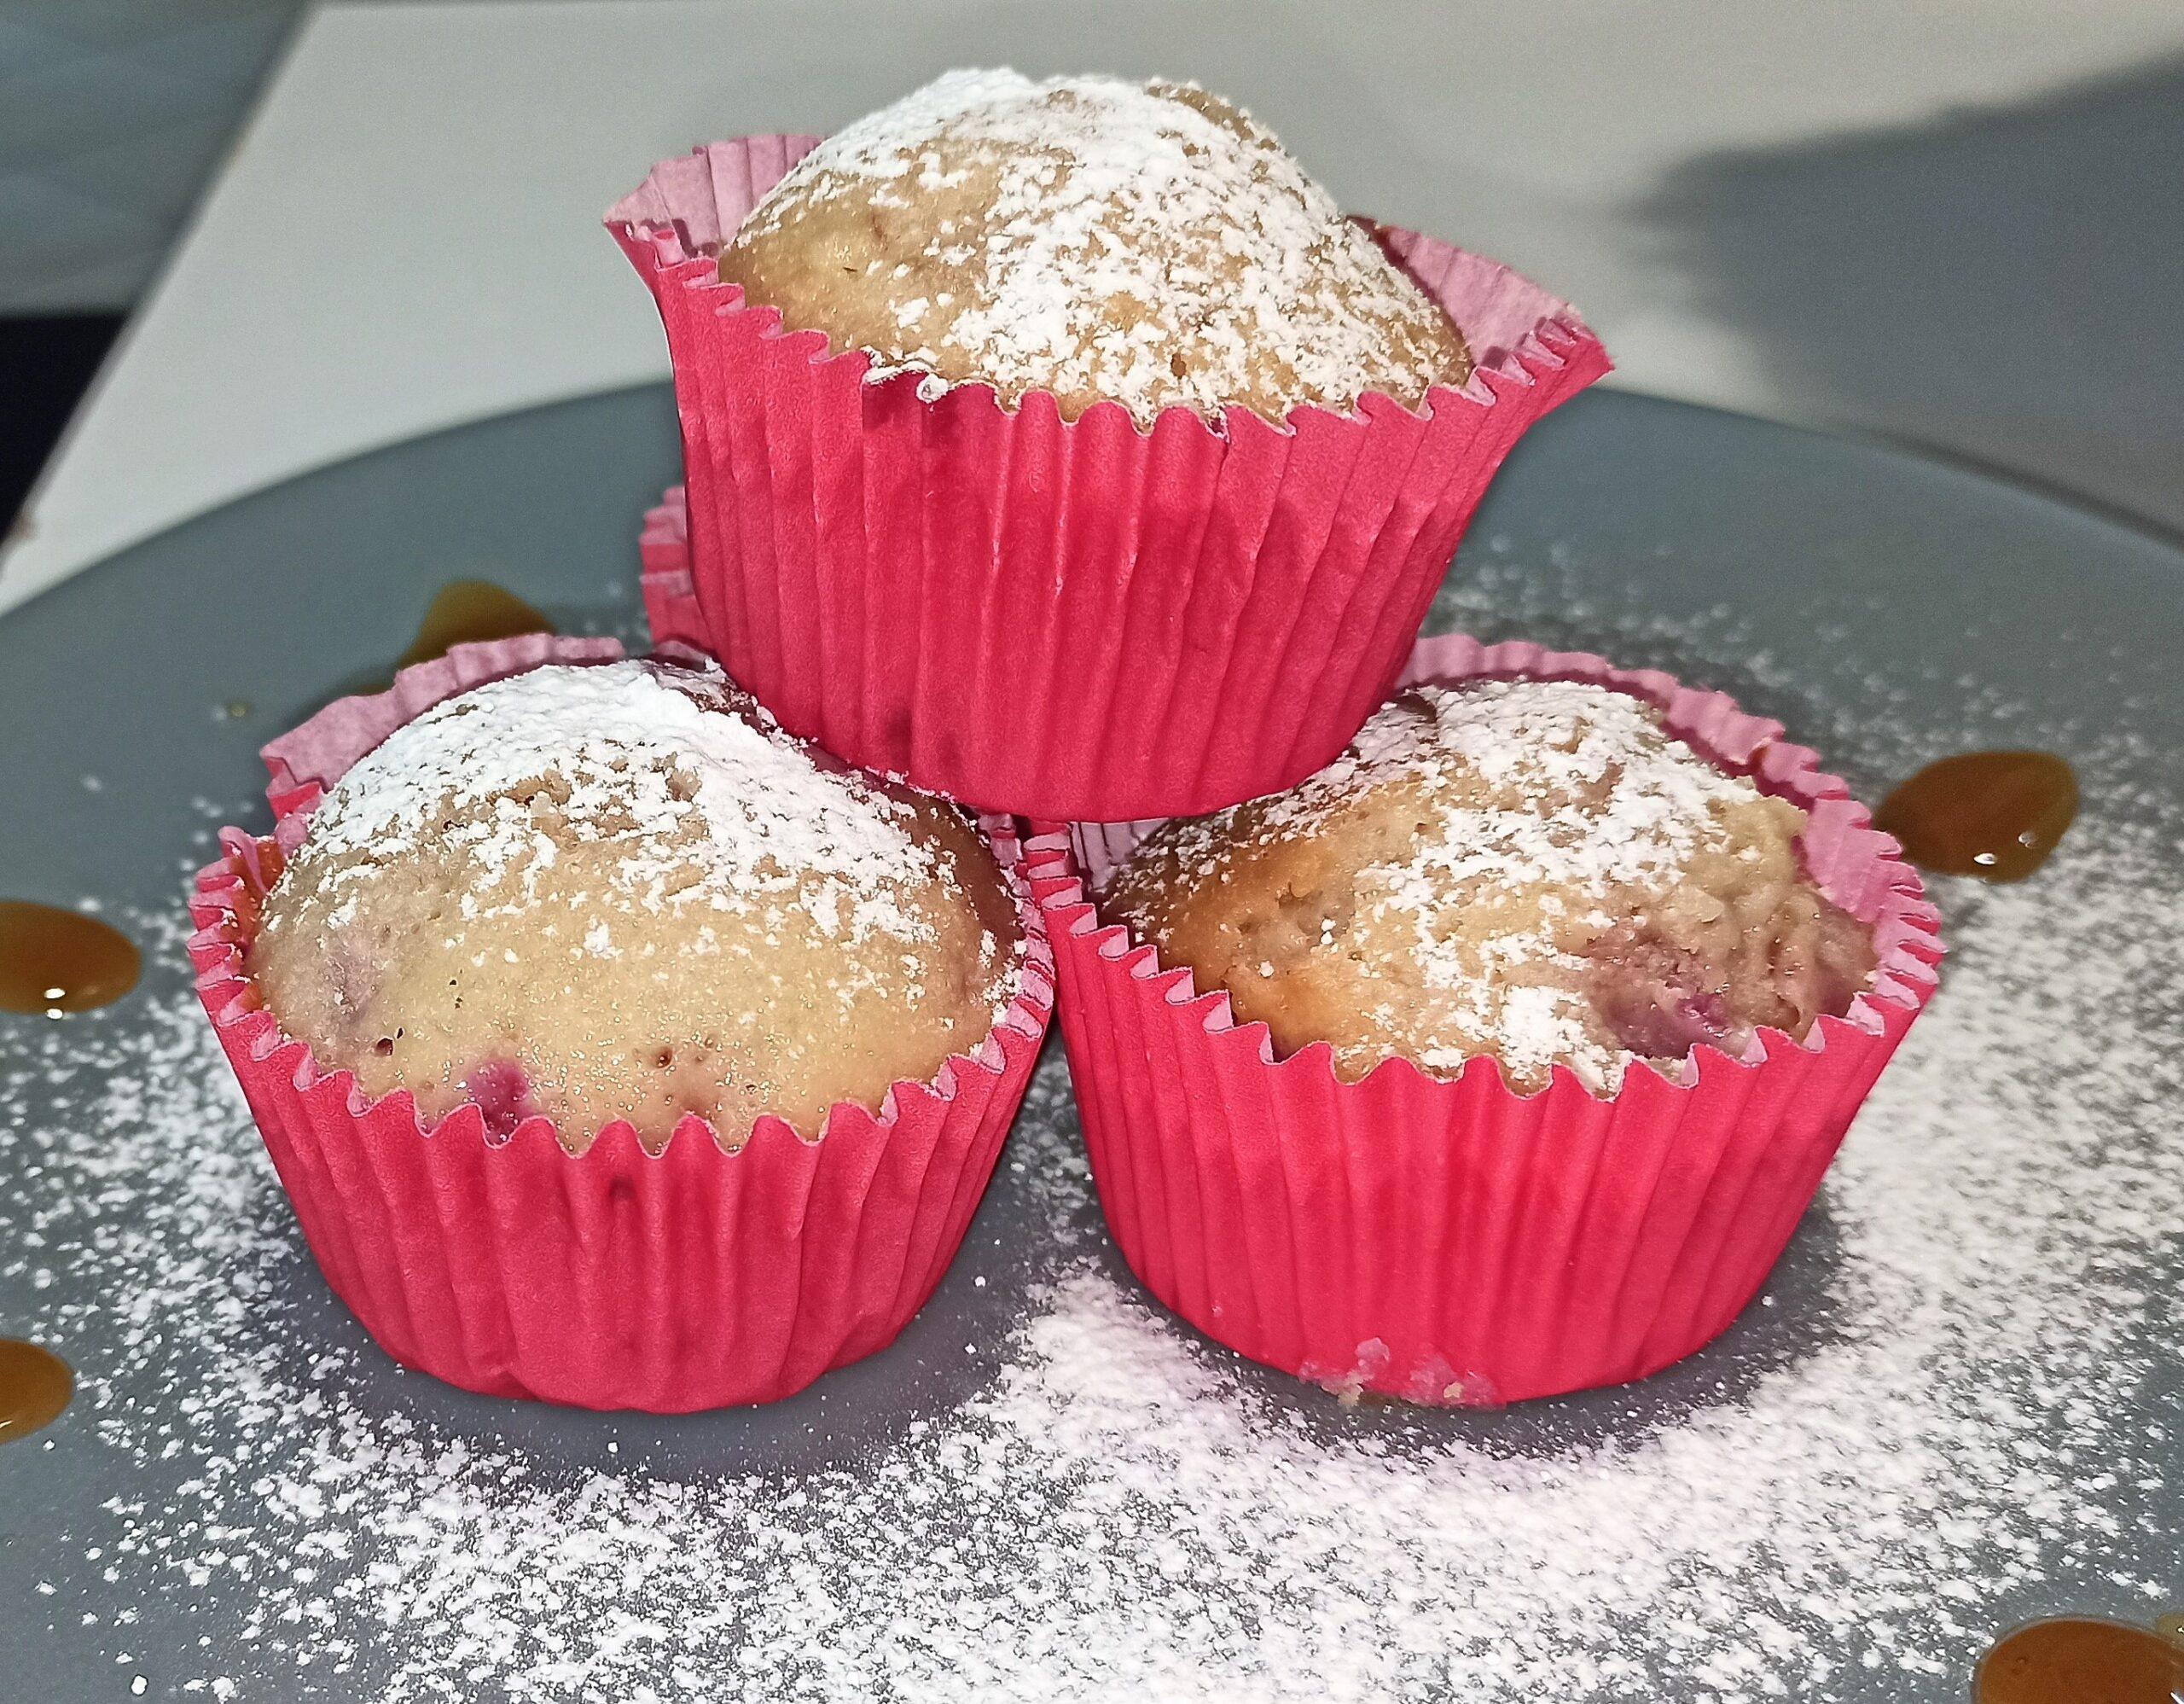 mini-plumcake-estivi,-da-mangiare-in-un-boccone:-eccezionali-per-merenda